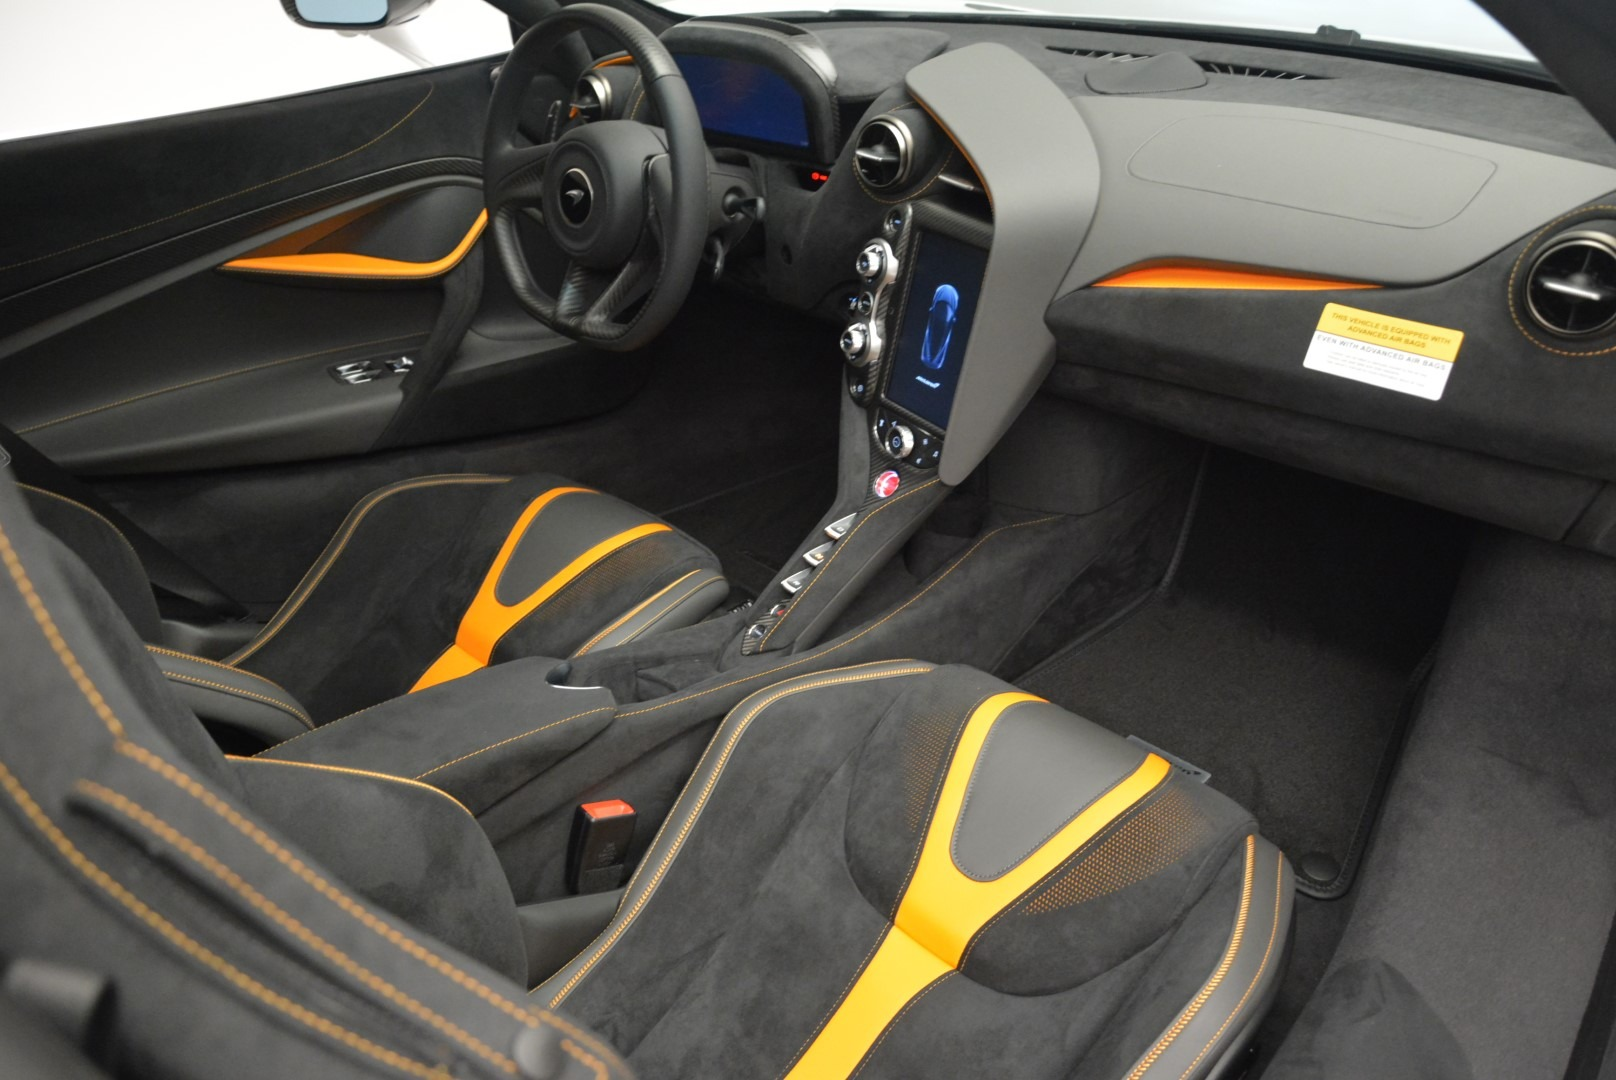 Used 2019 McLaren 720S Coupe For Sale In Westport, CT 2543_p18